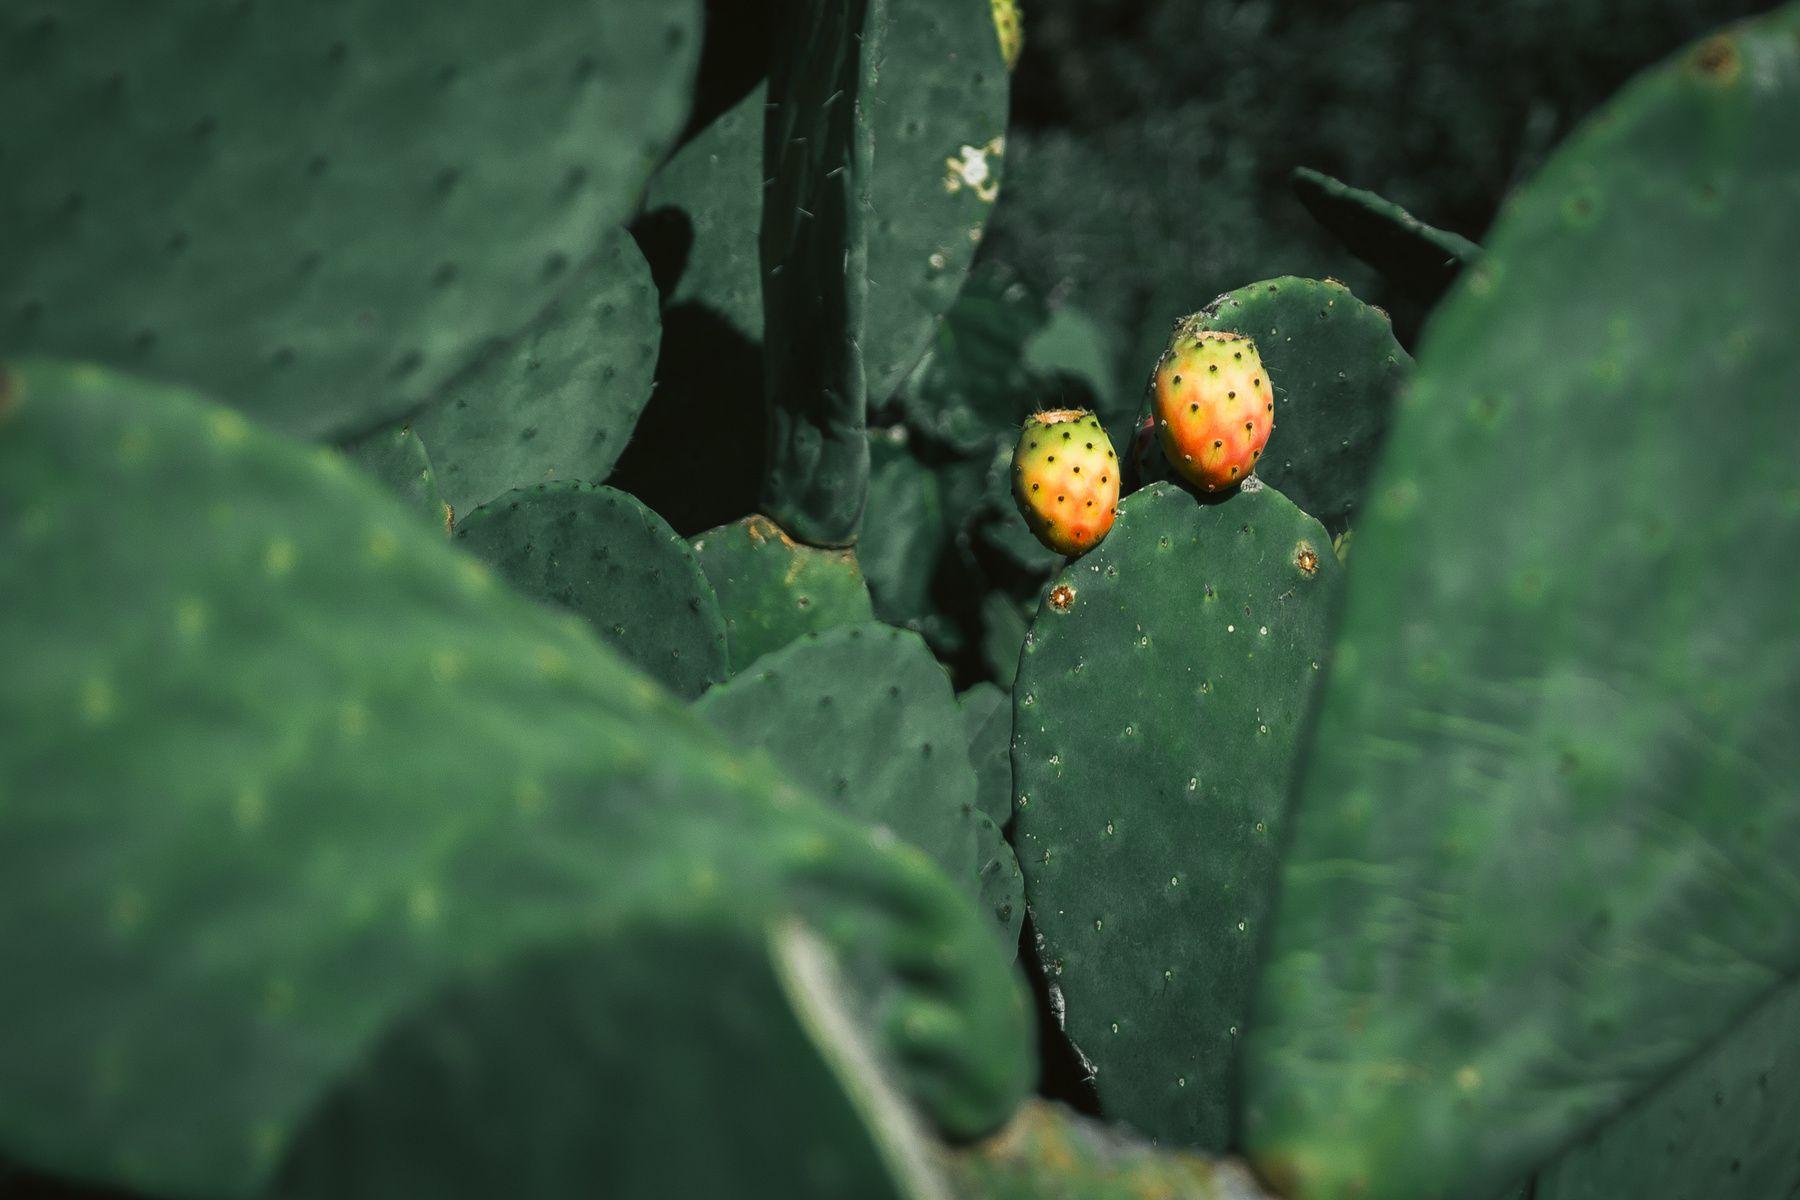 #travel #cactus #fruit #green #rawfood Kalle Lundholm Photography - Favignana, Italy   sept 2013